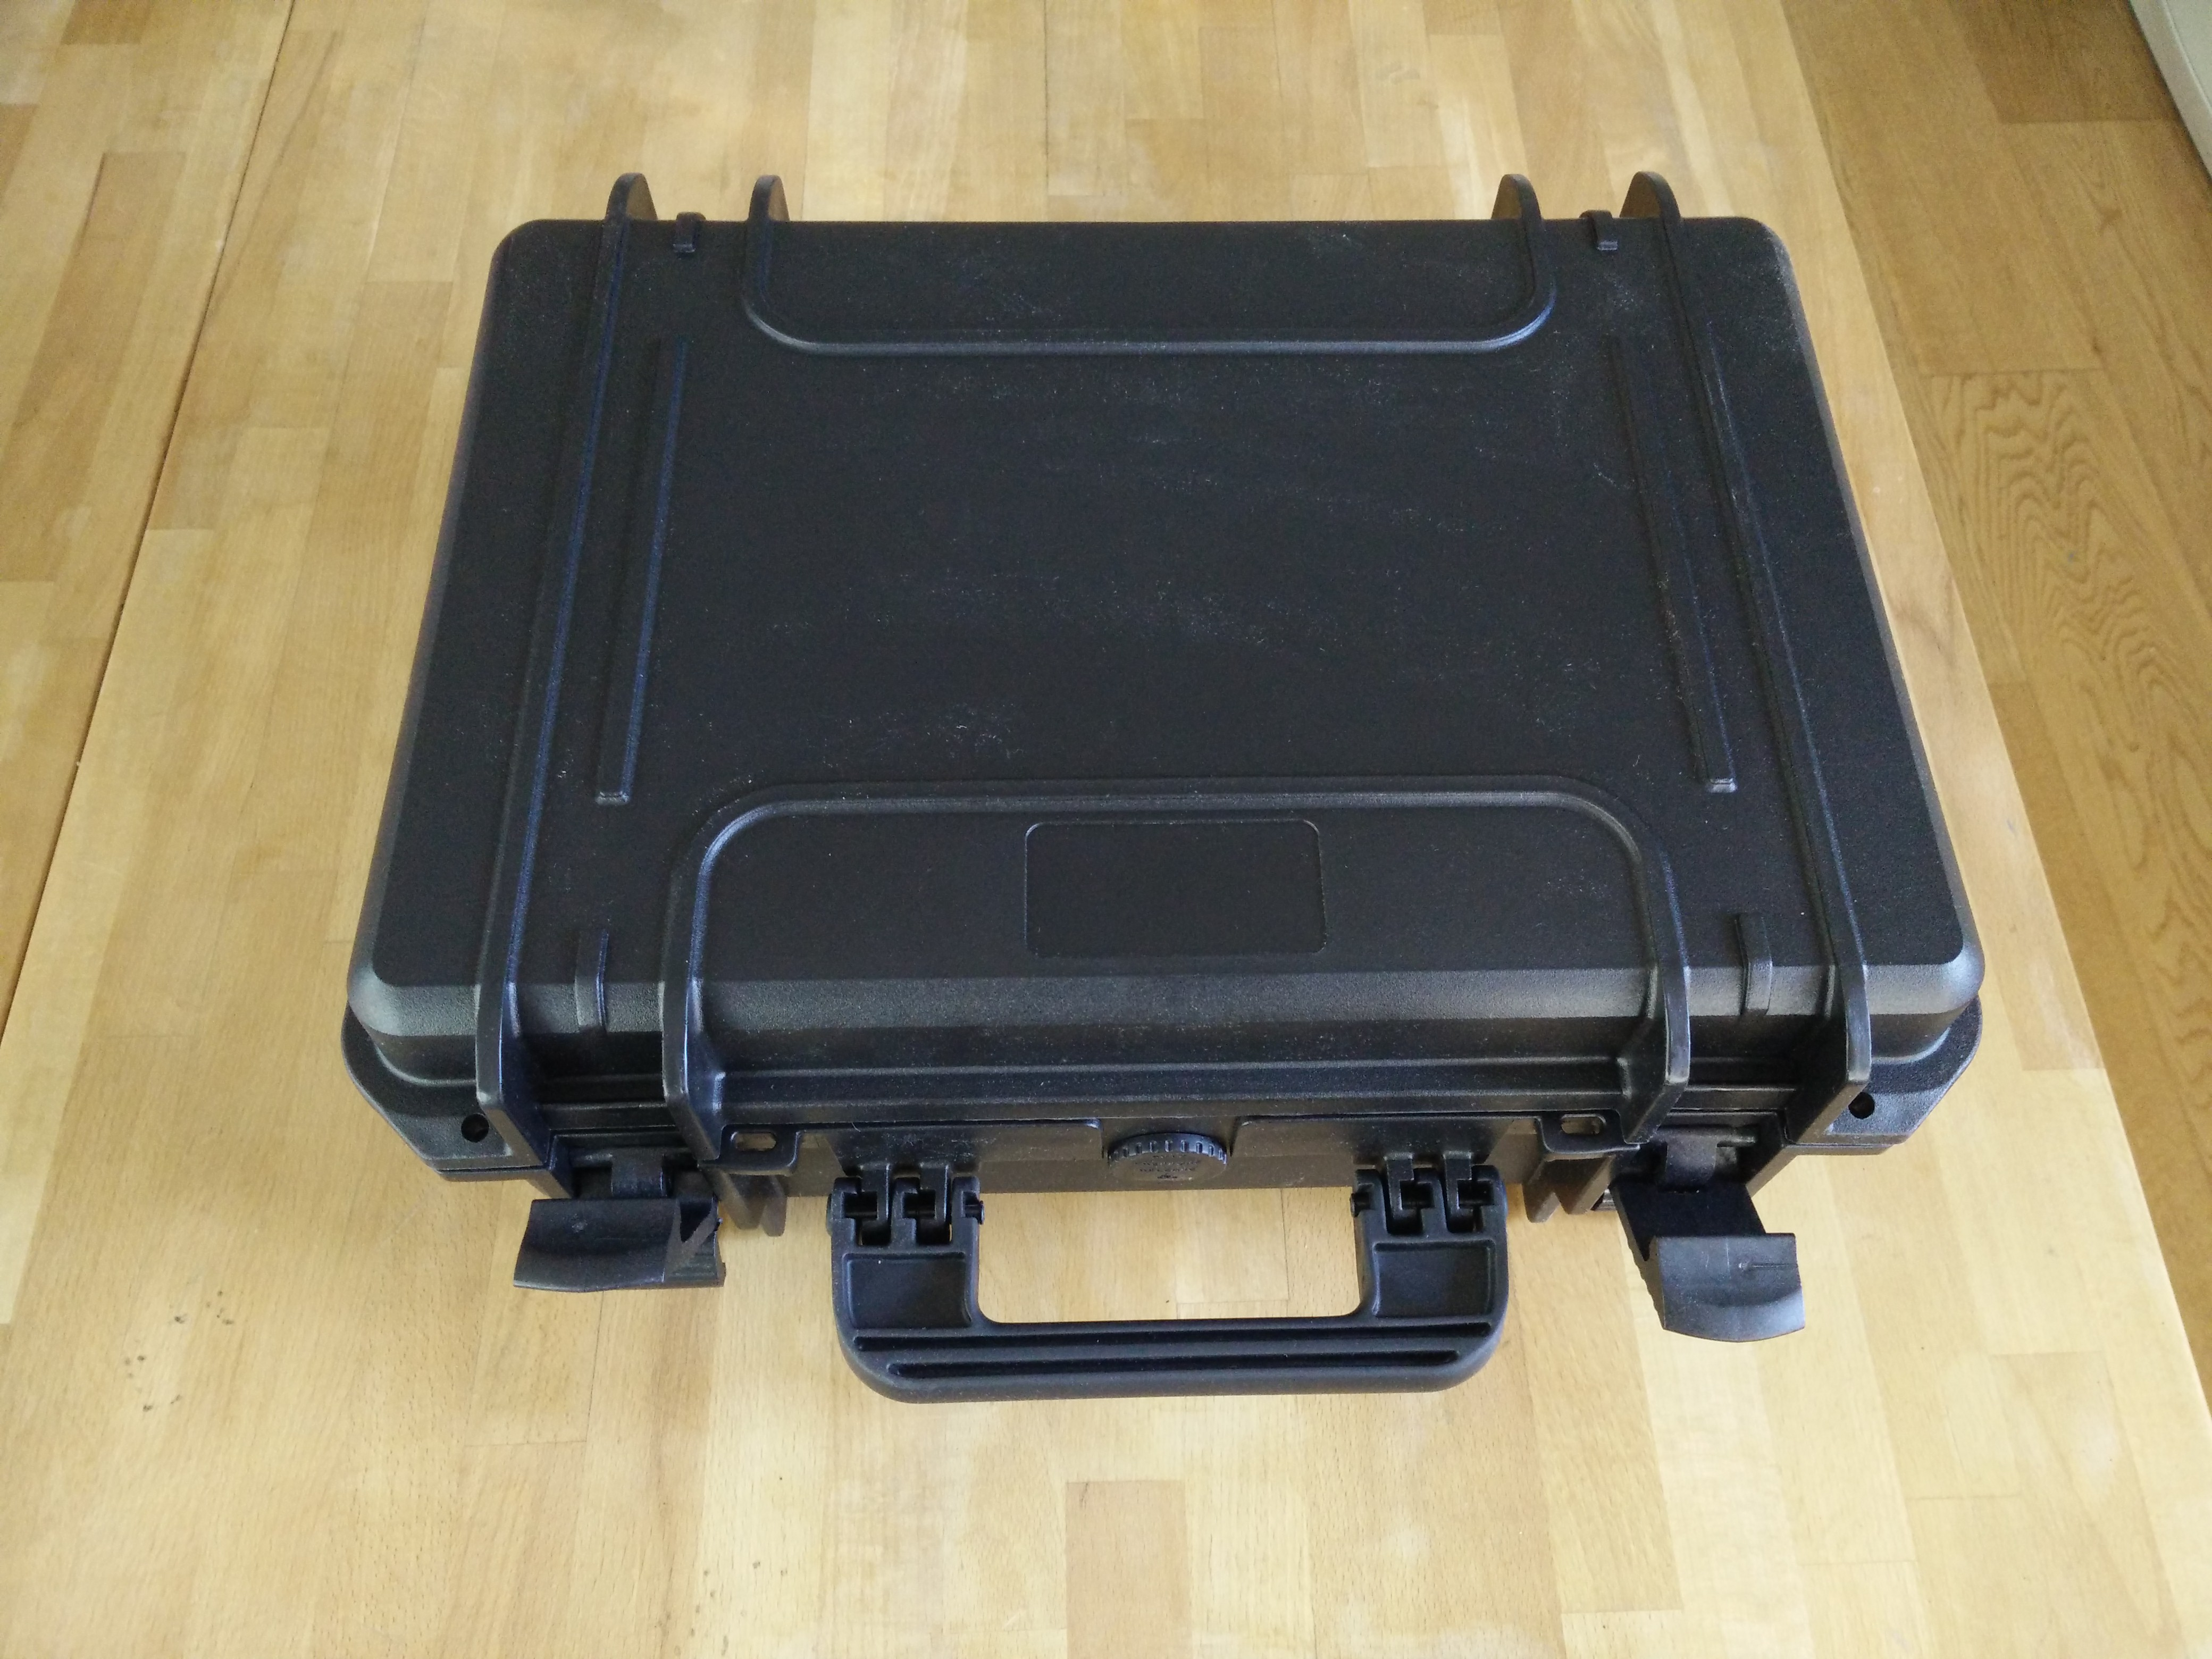 Splashproof case 430